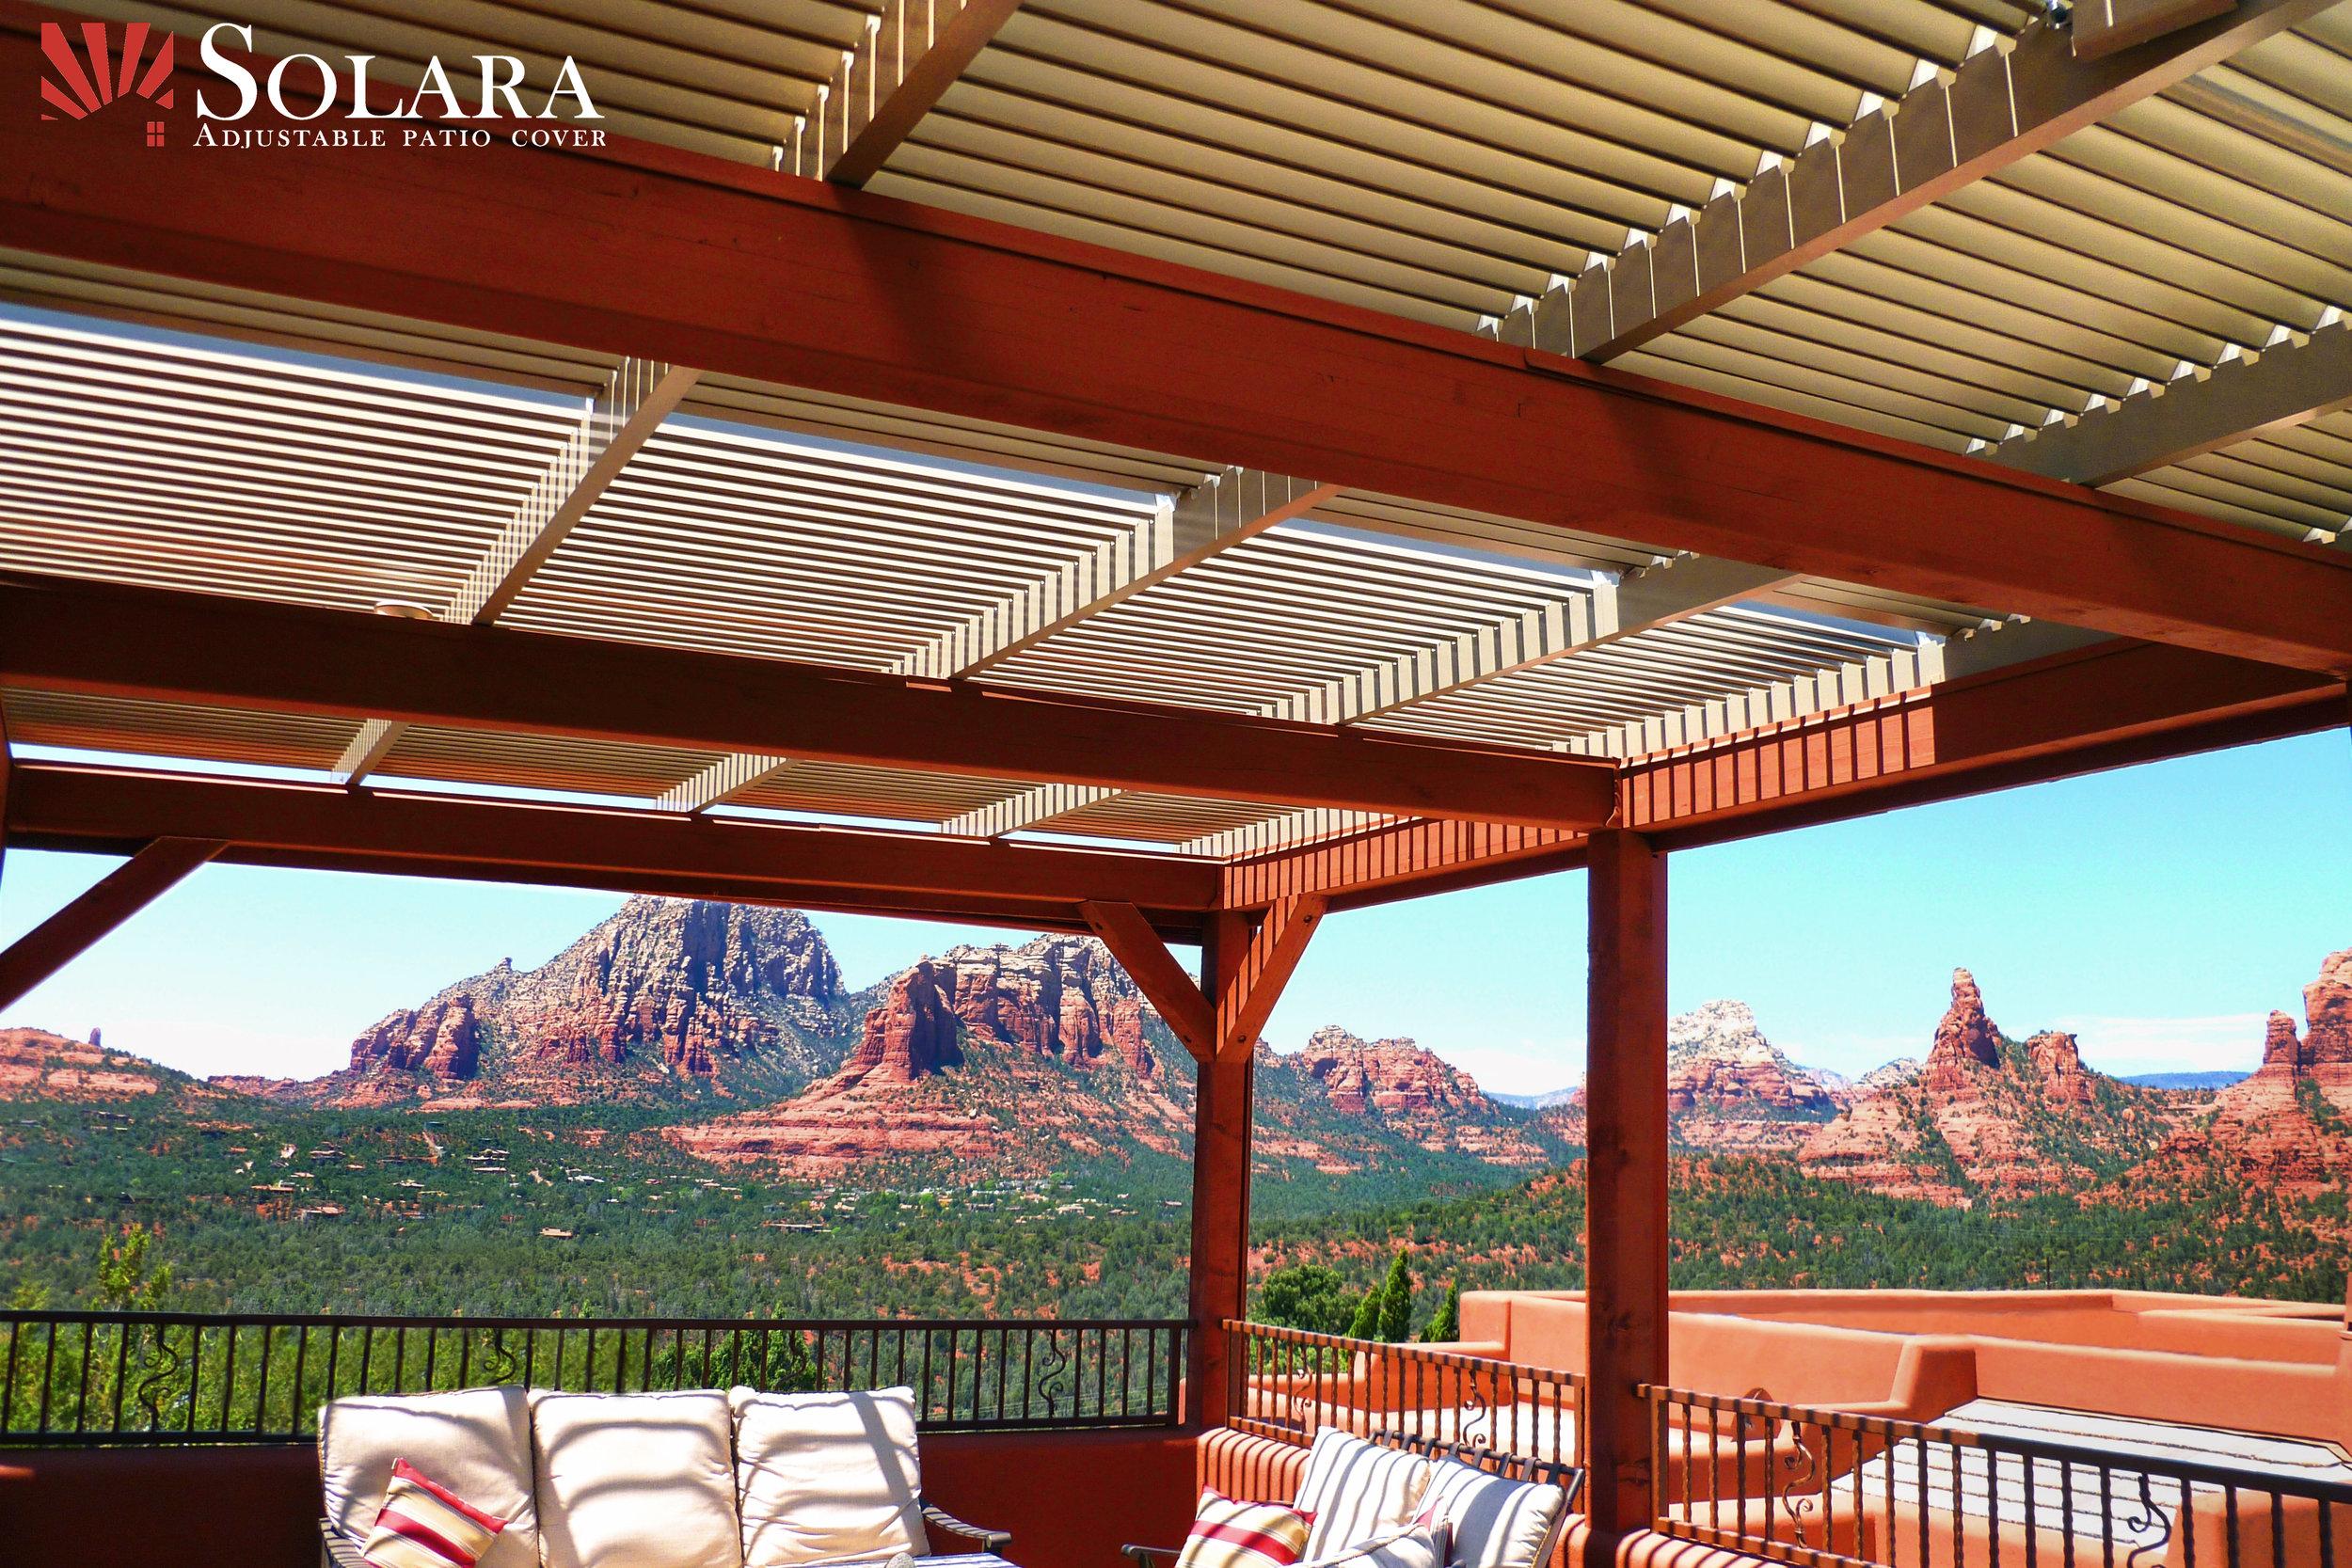 Aluminum-Roof-System-in-Sedona-Arizona-.jpg